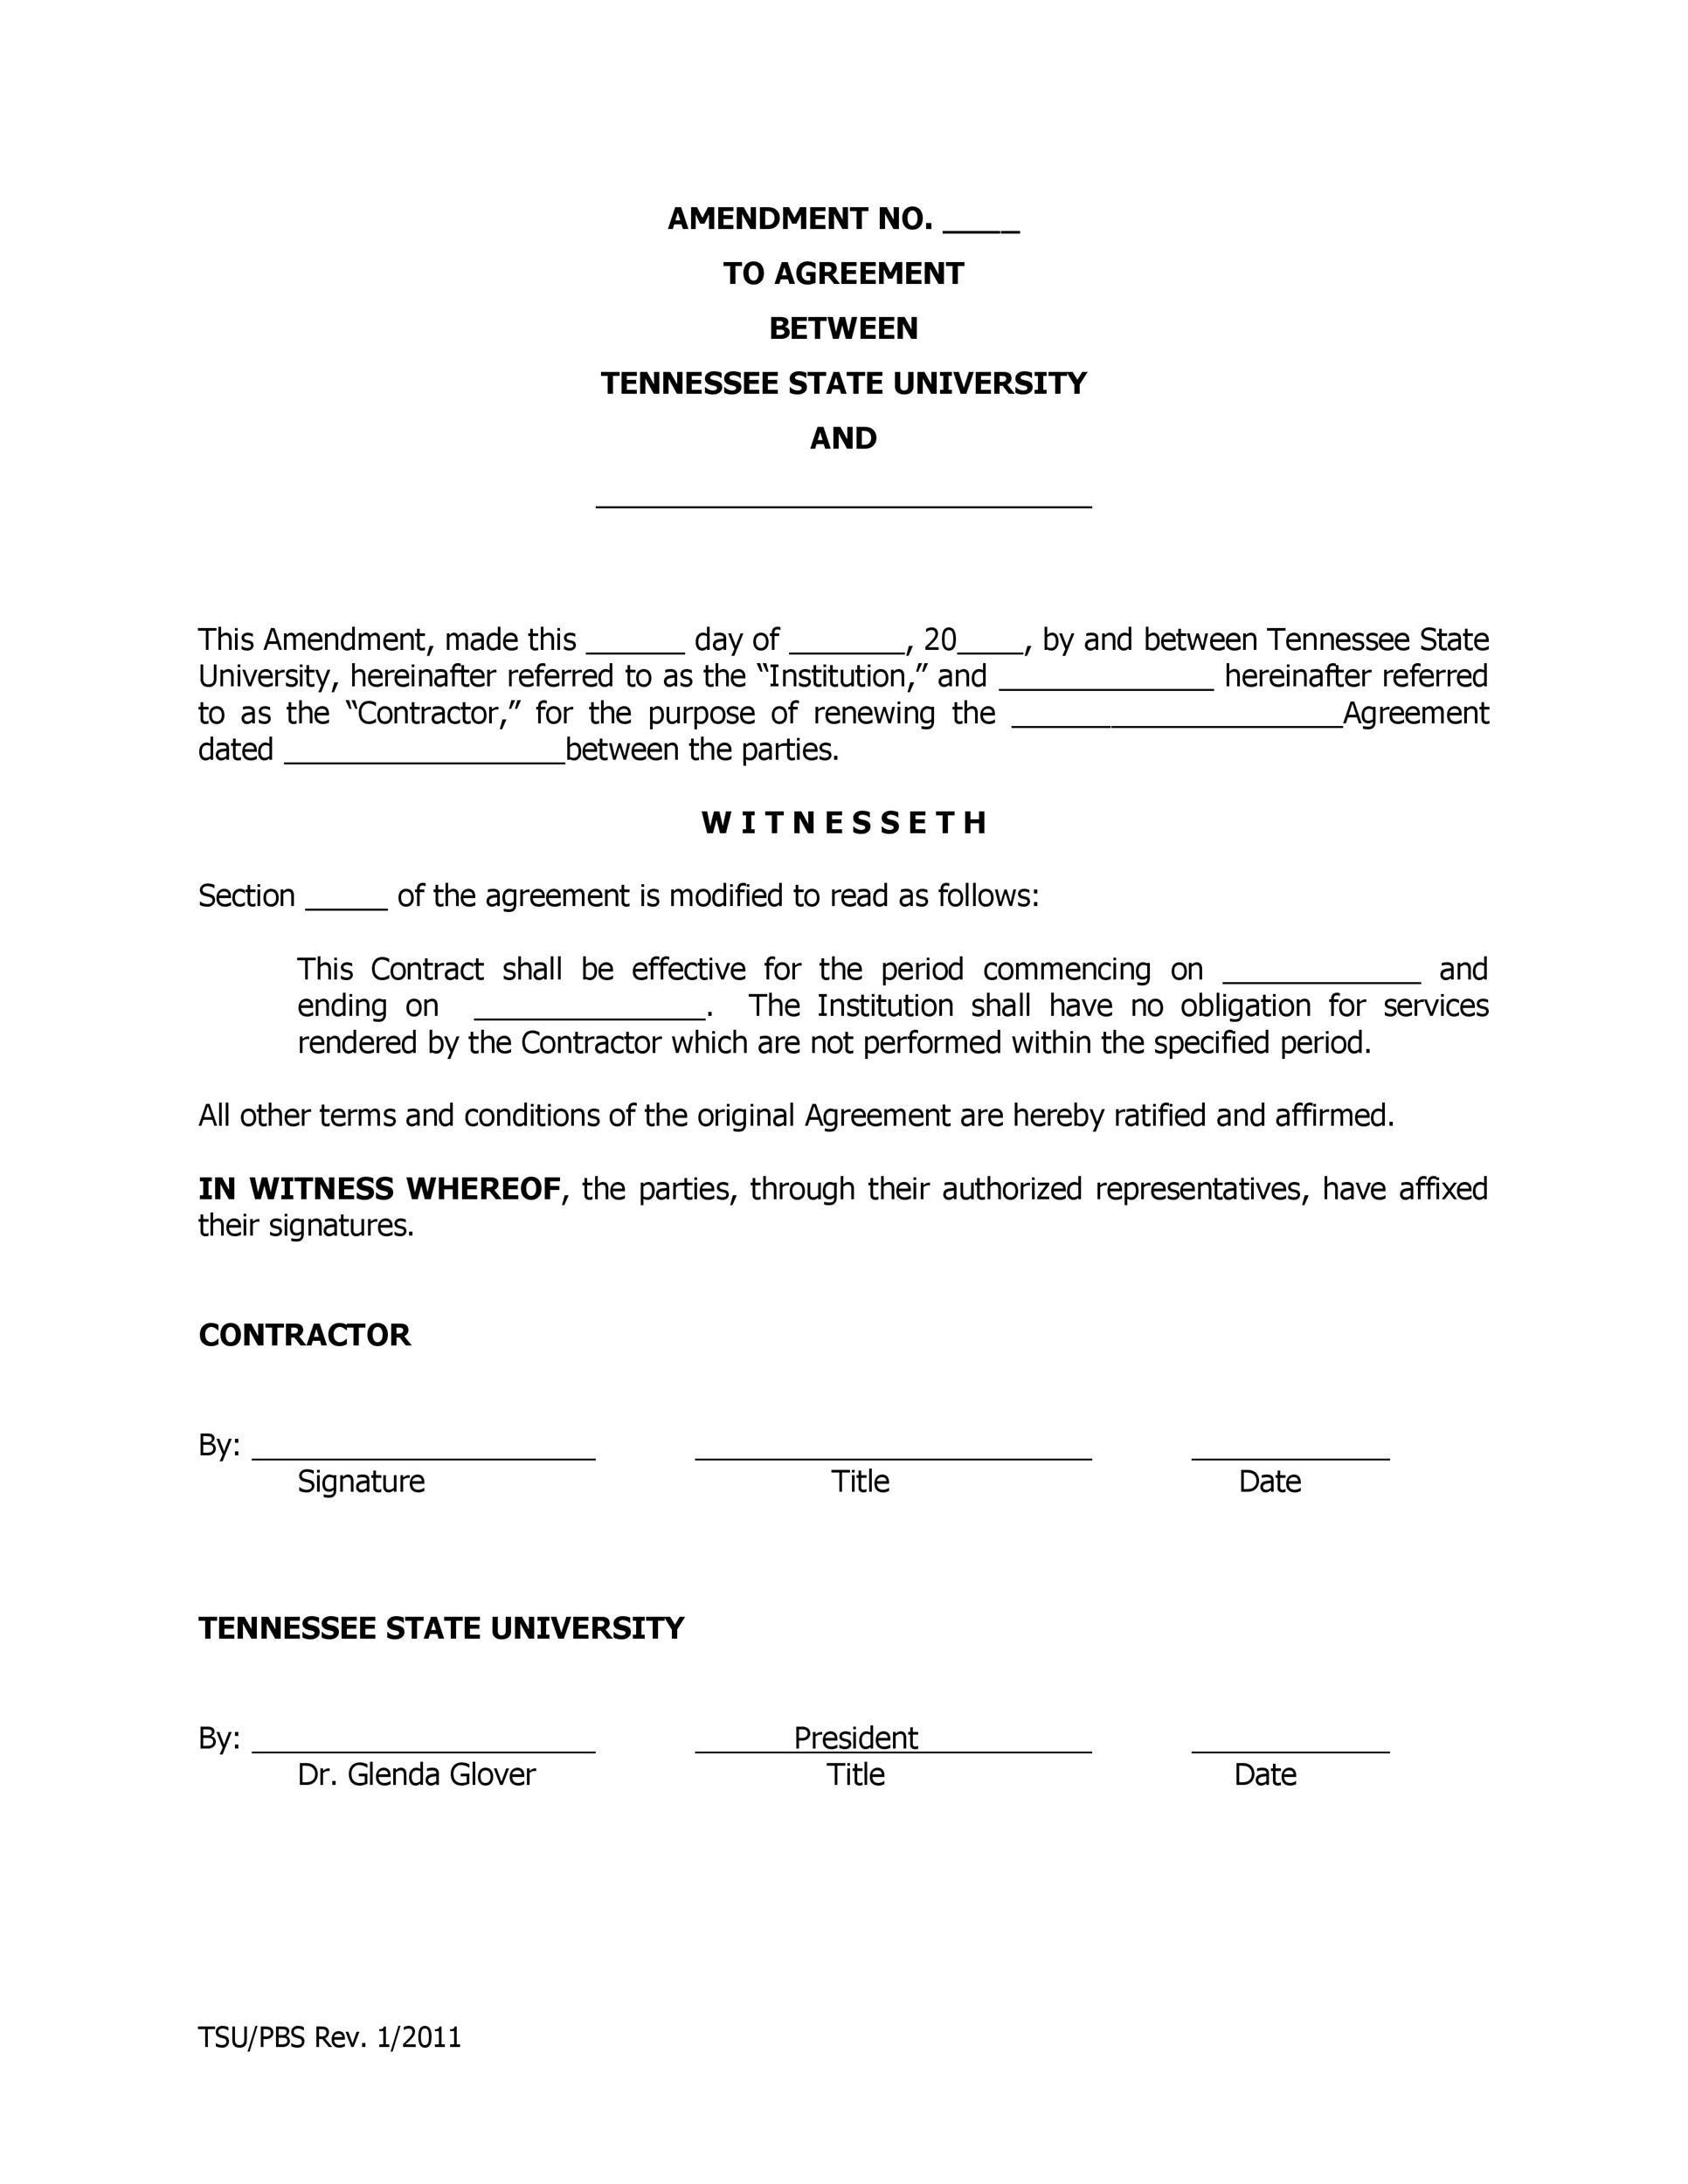 Free contract amendment 04